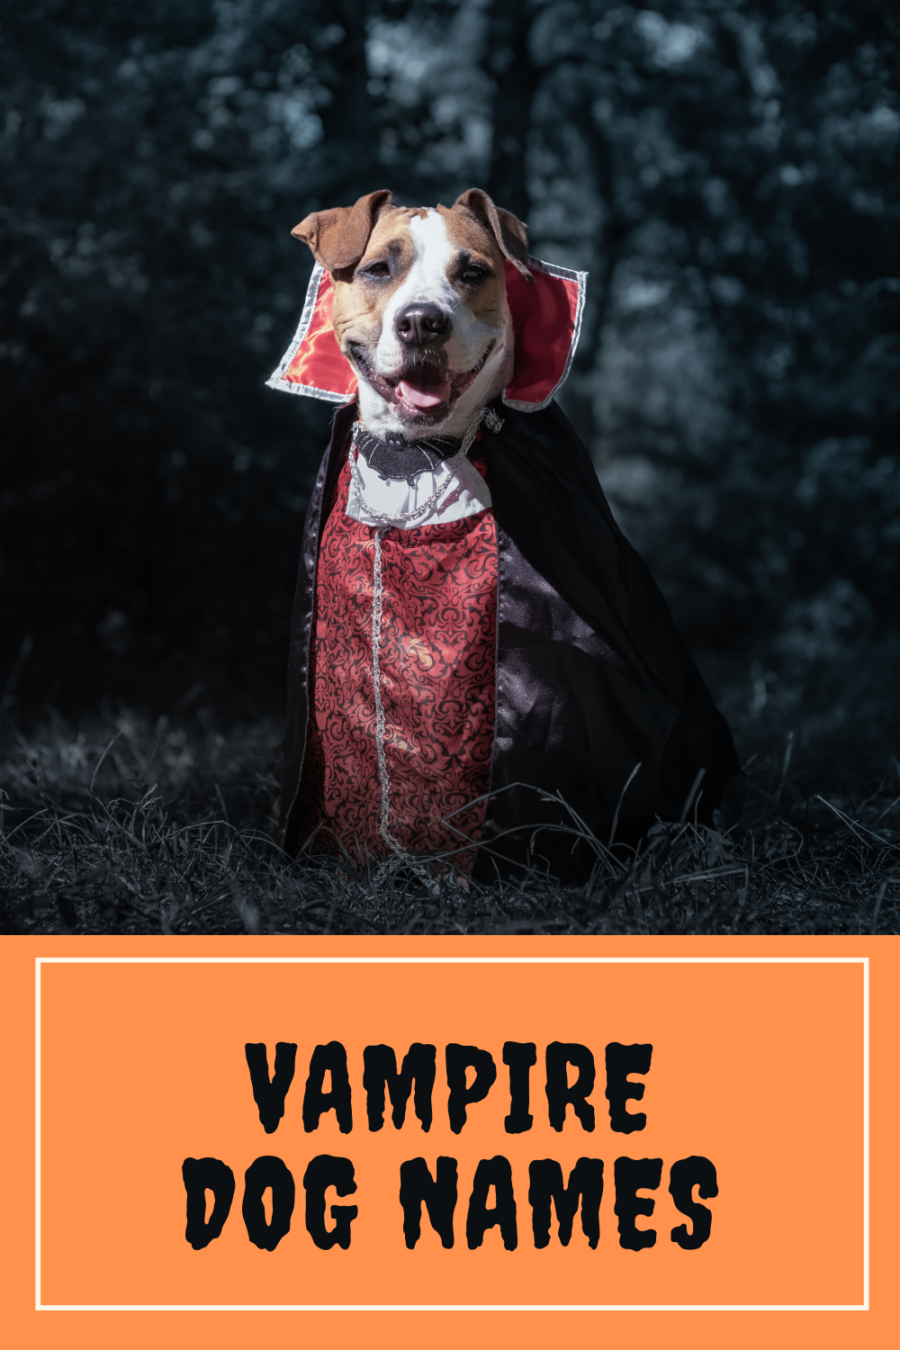 VAMPIRE DOG NAMES